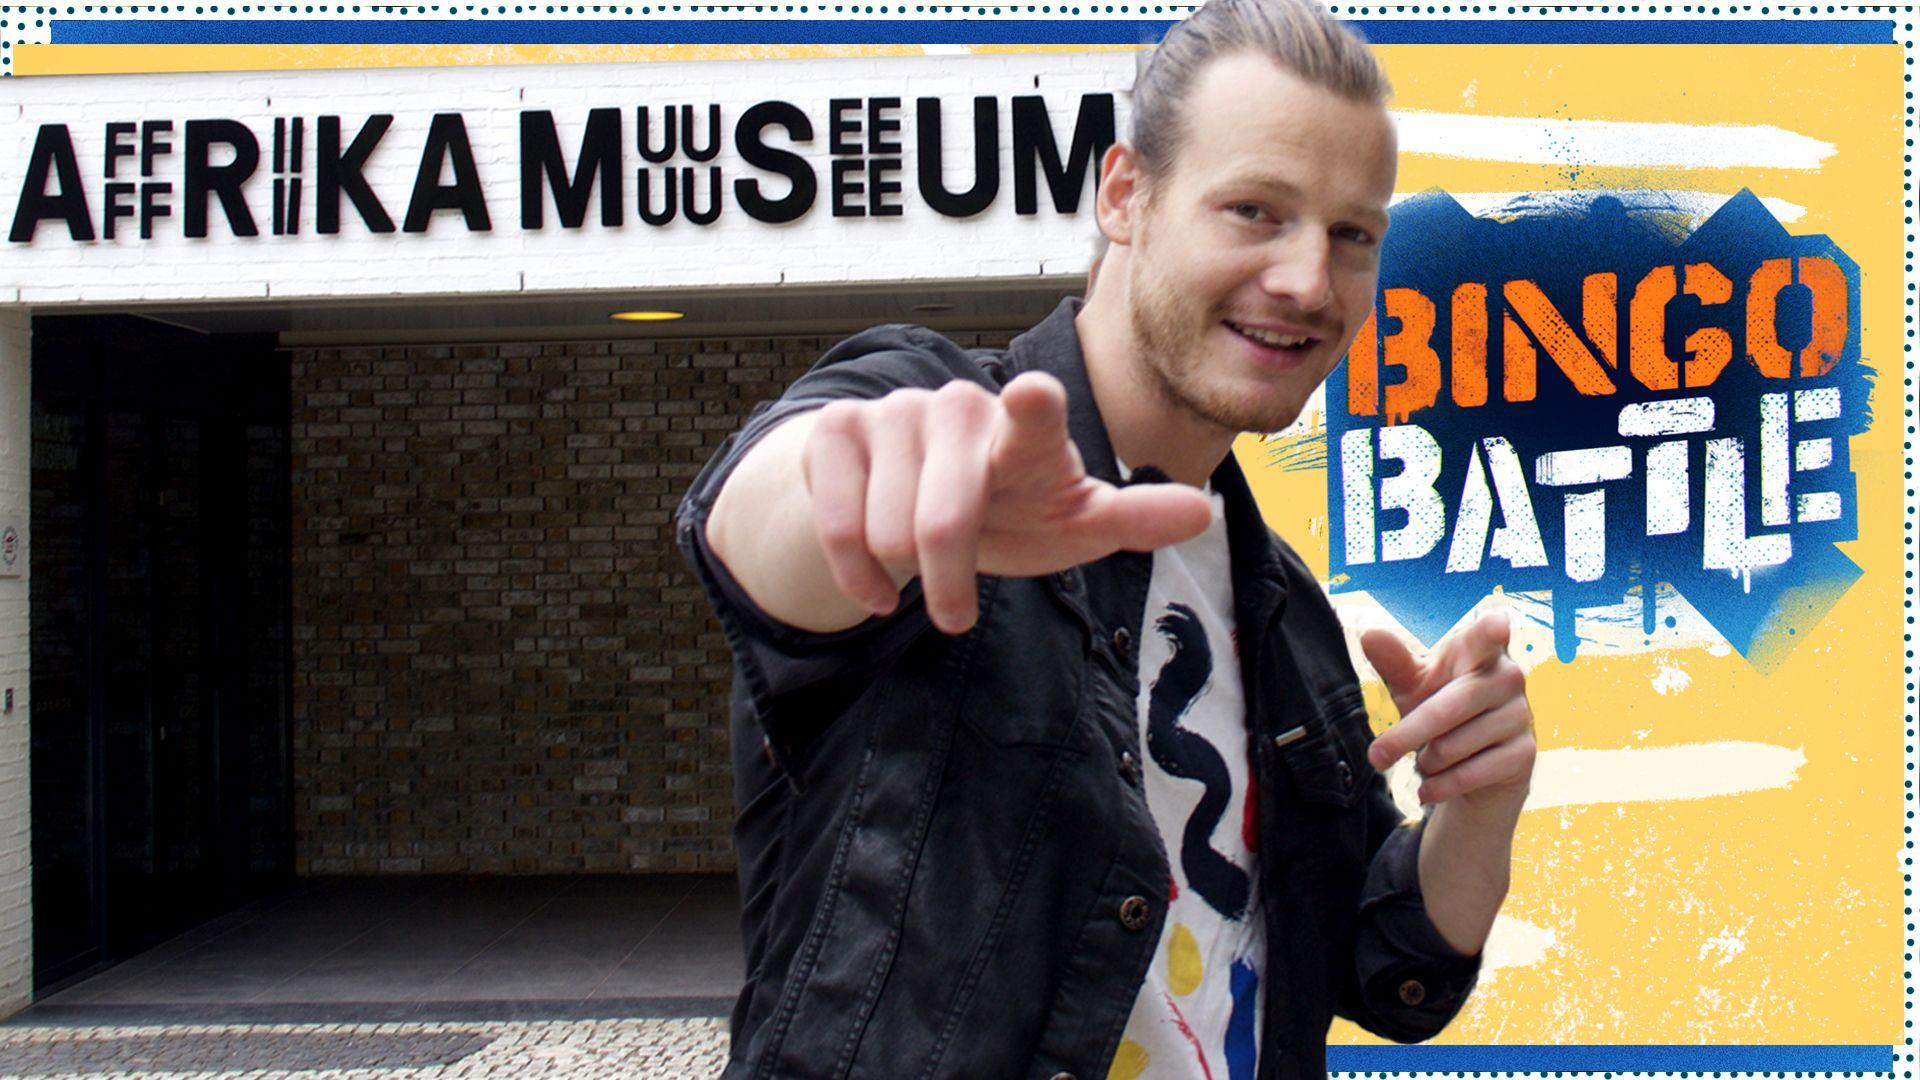 guido spek, afrika museum, gtst, museumtv, cjp, bingo battle